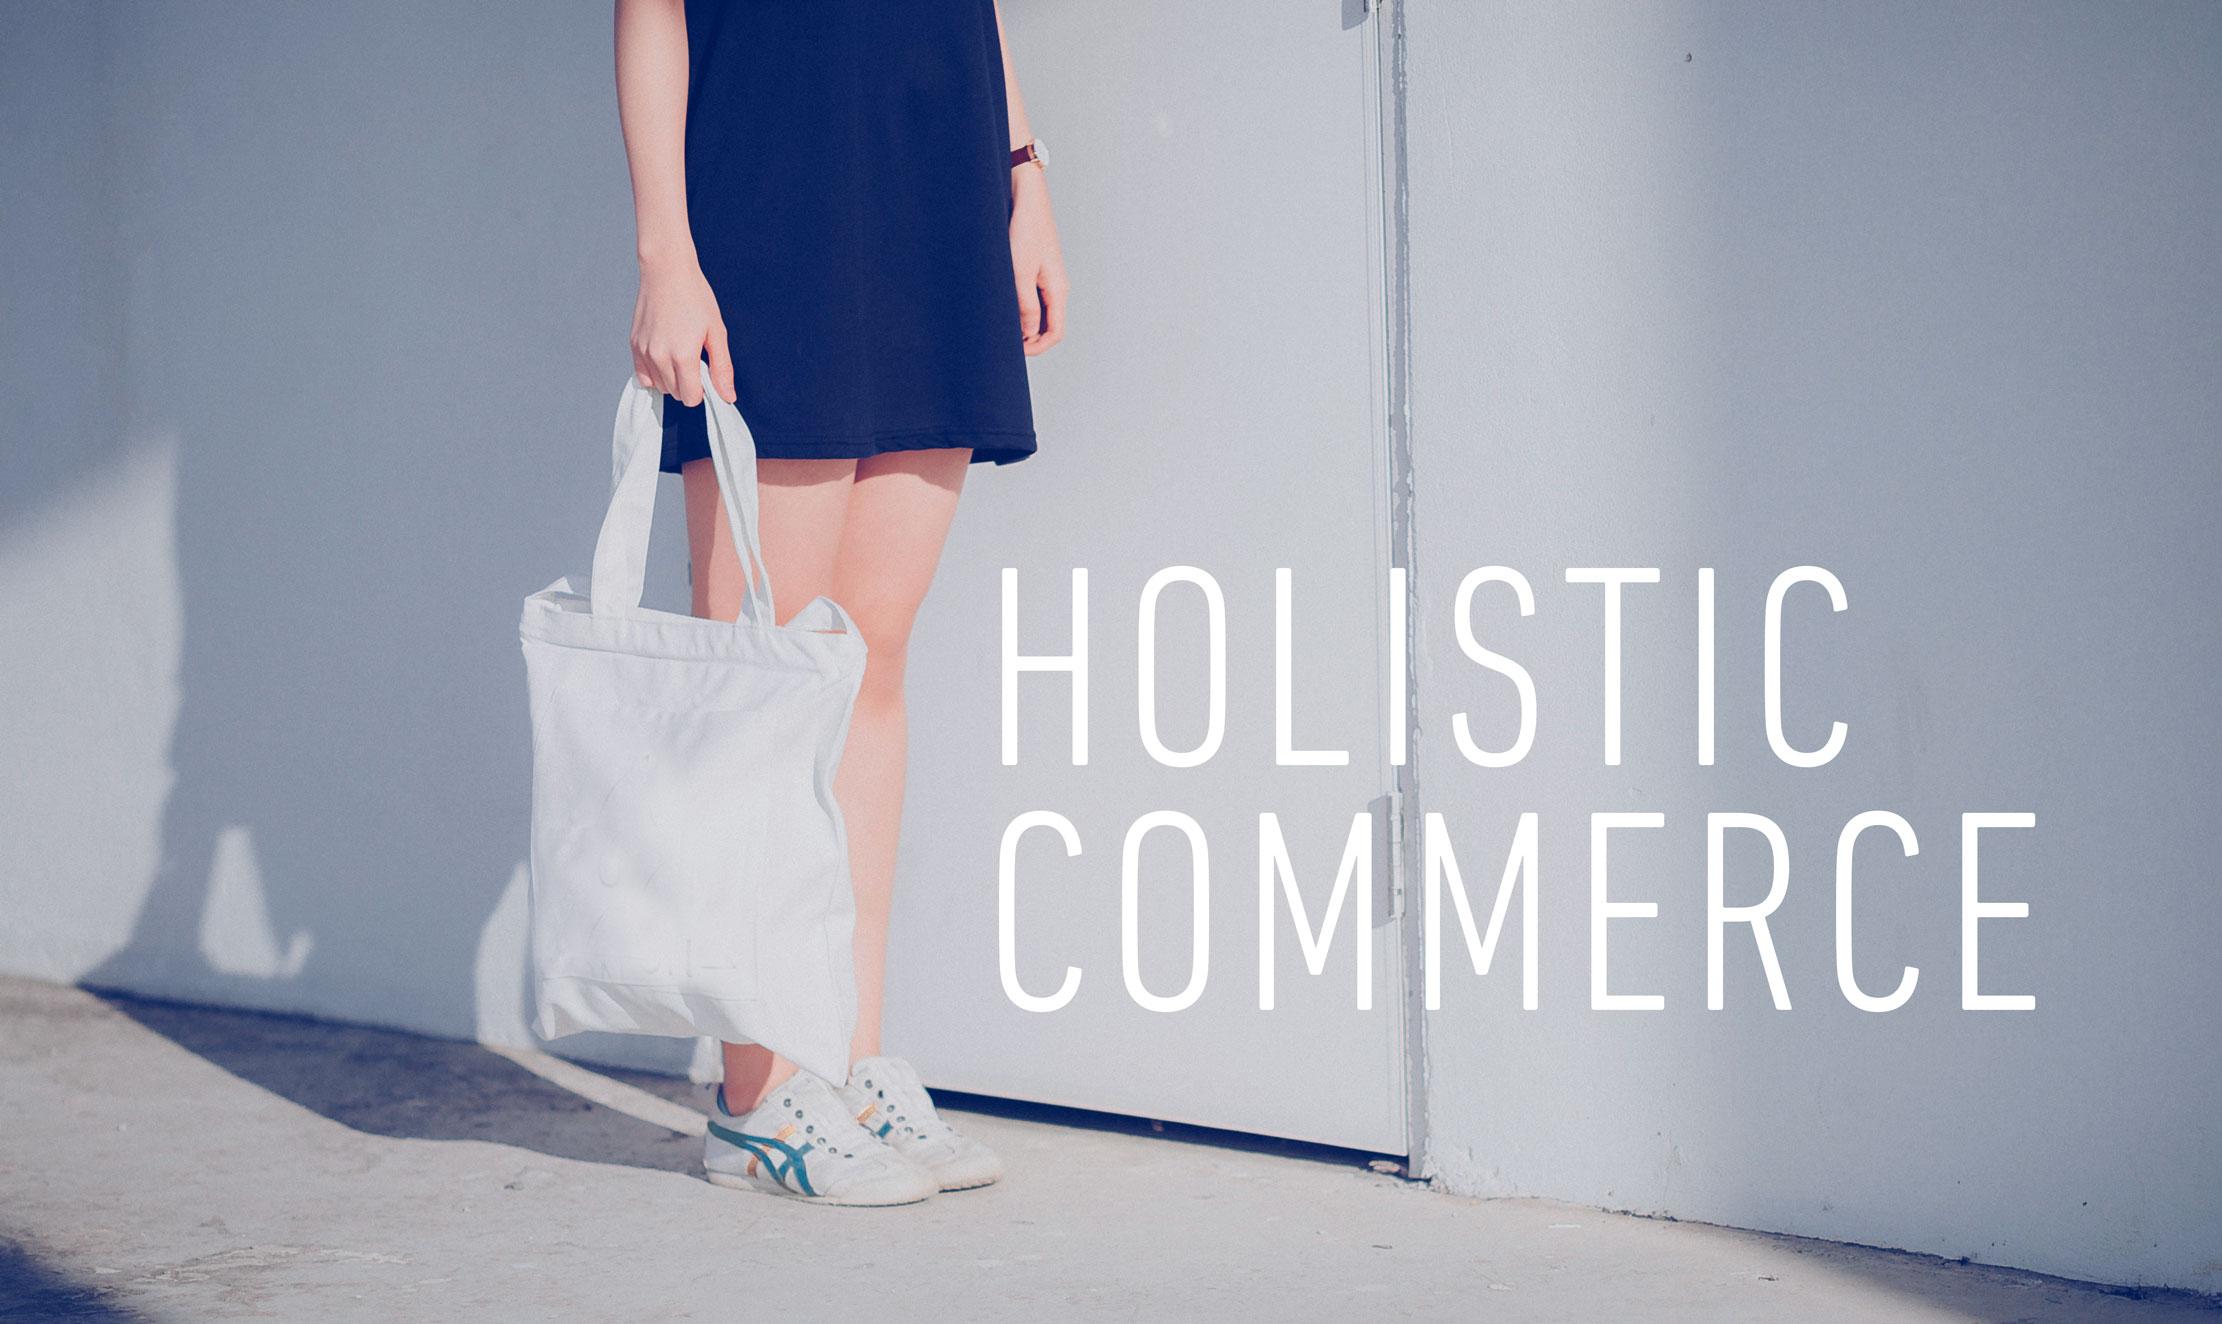 holistic1.jpg